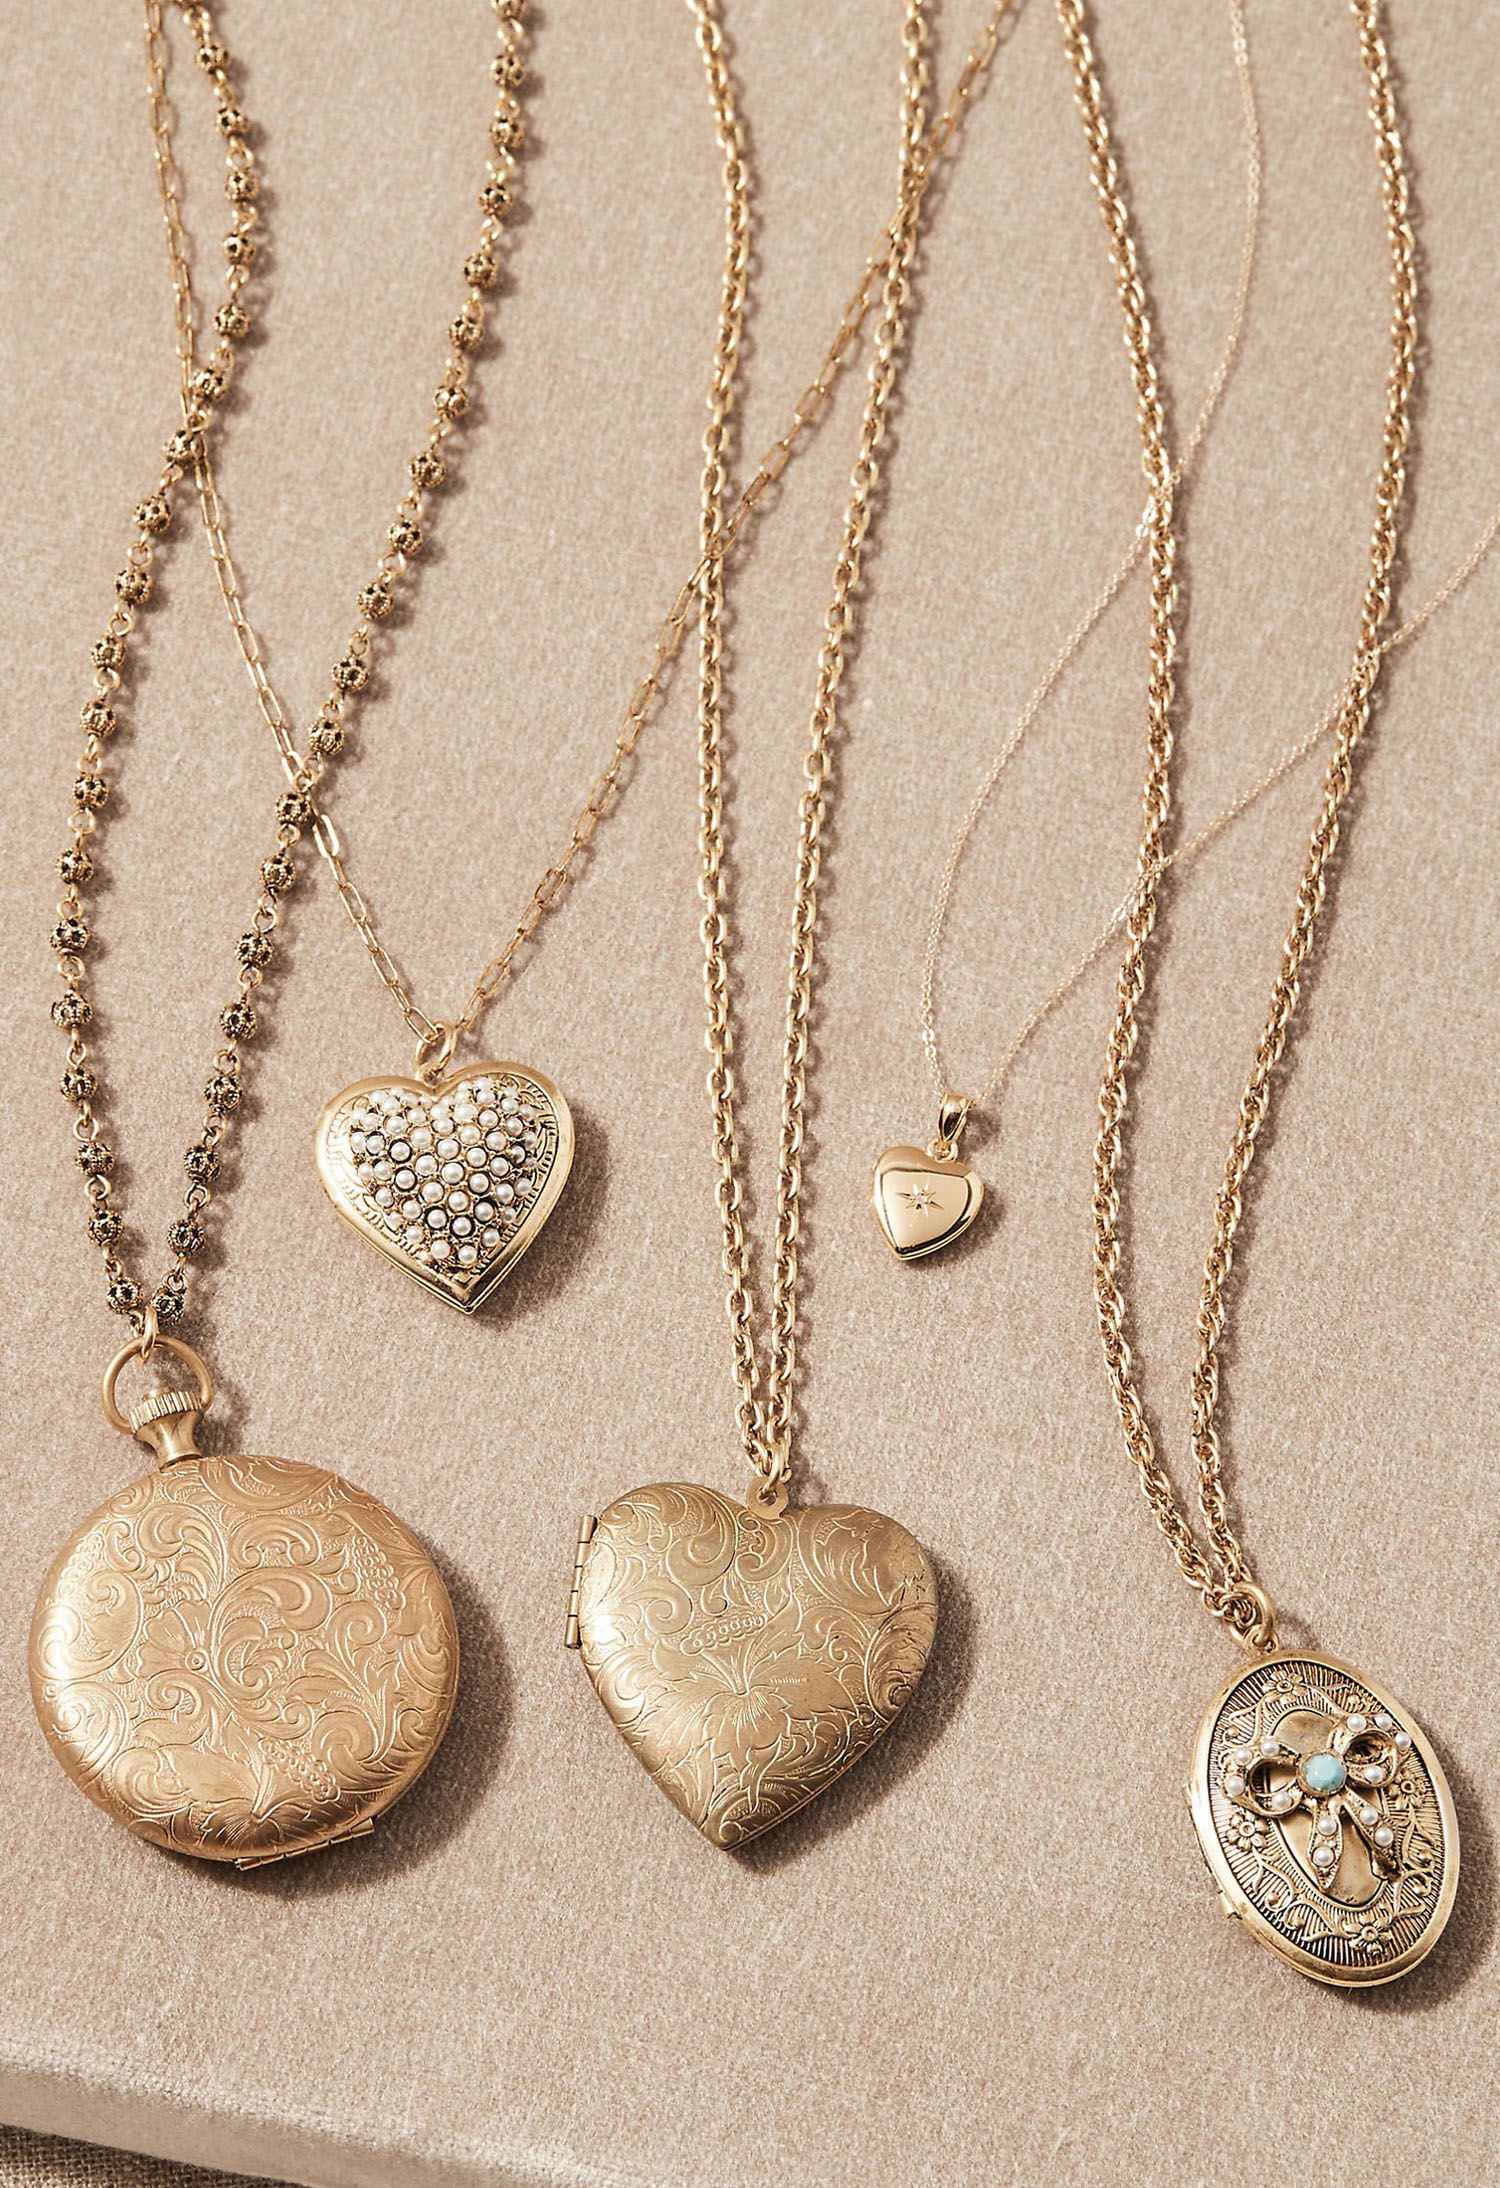 locket necklace bridesmaid jewelry bridal party gift idea